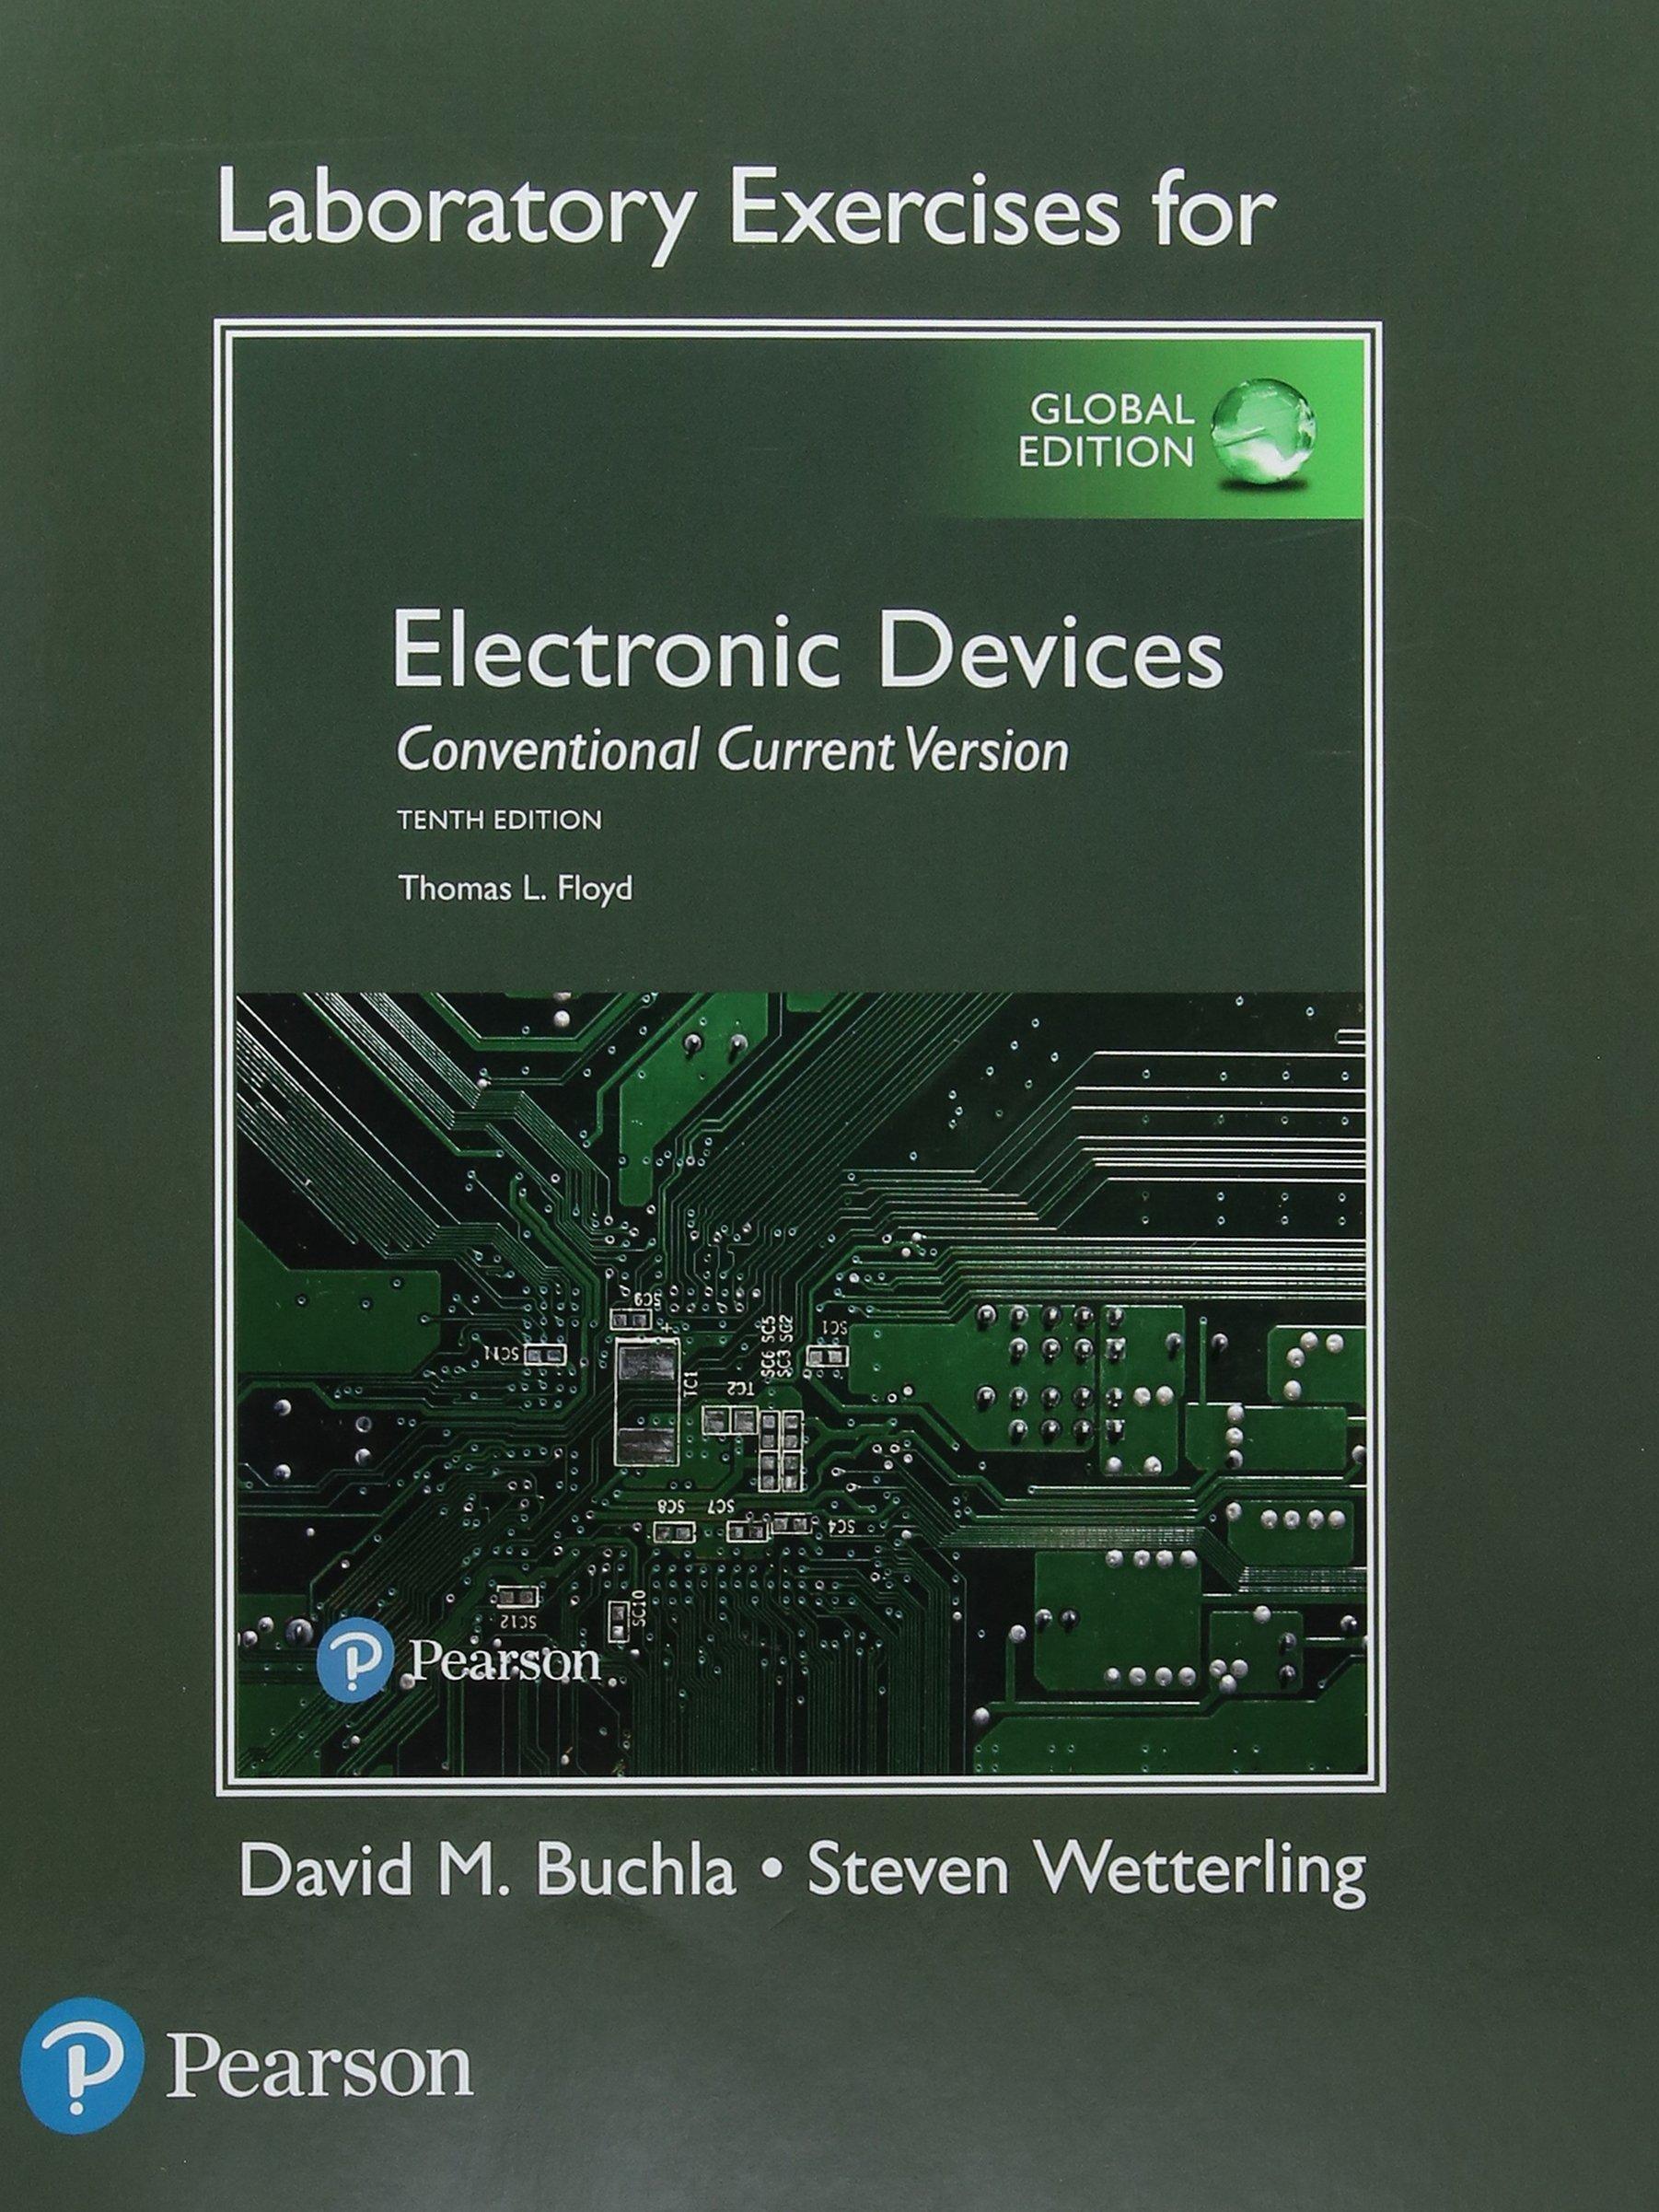 Lab manual for Electronic Devices, Global Edition: Amazon.es: Floyd, Thomas L.: Libros en idiomas extranjeros